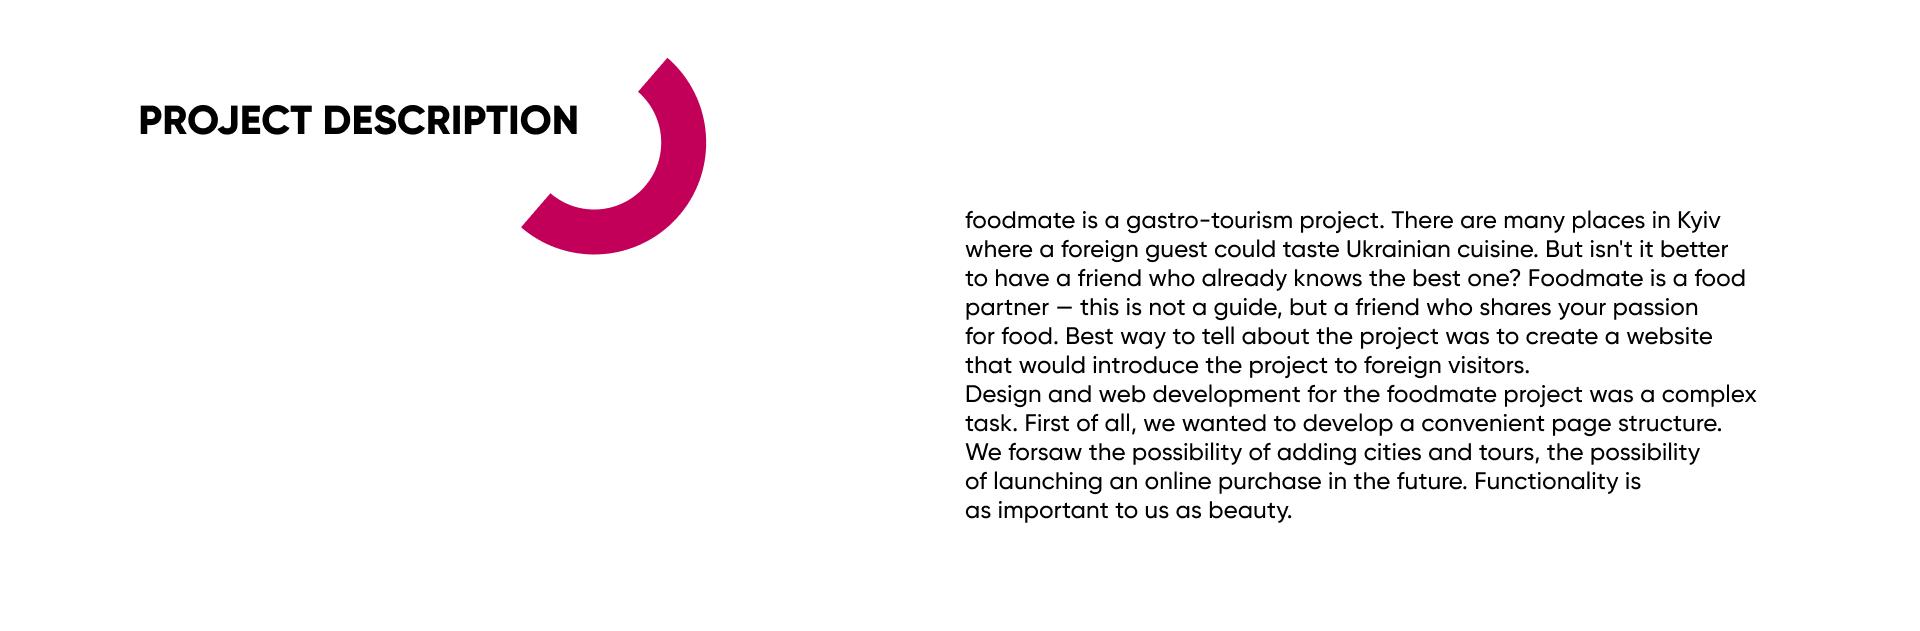 Опис проекту foodmate